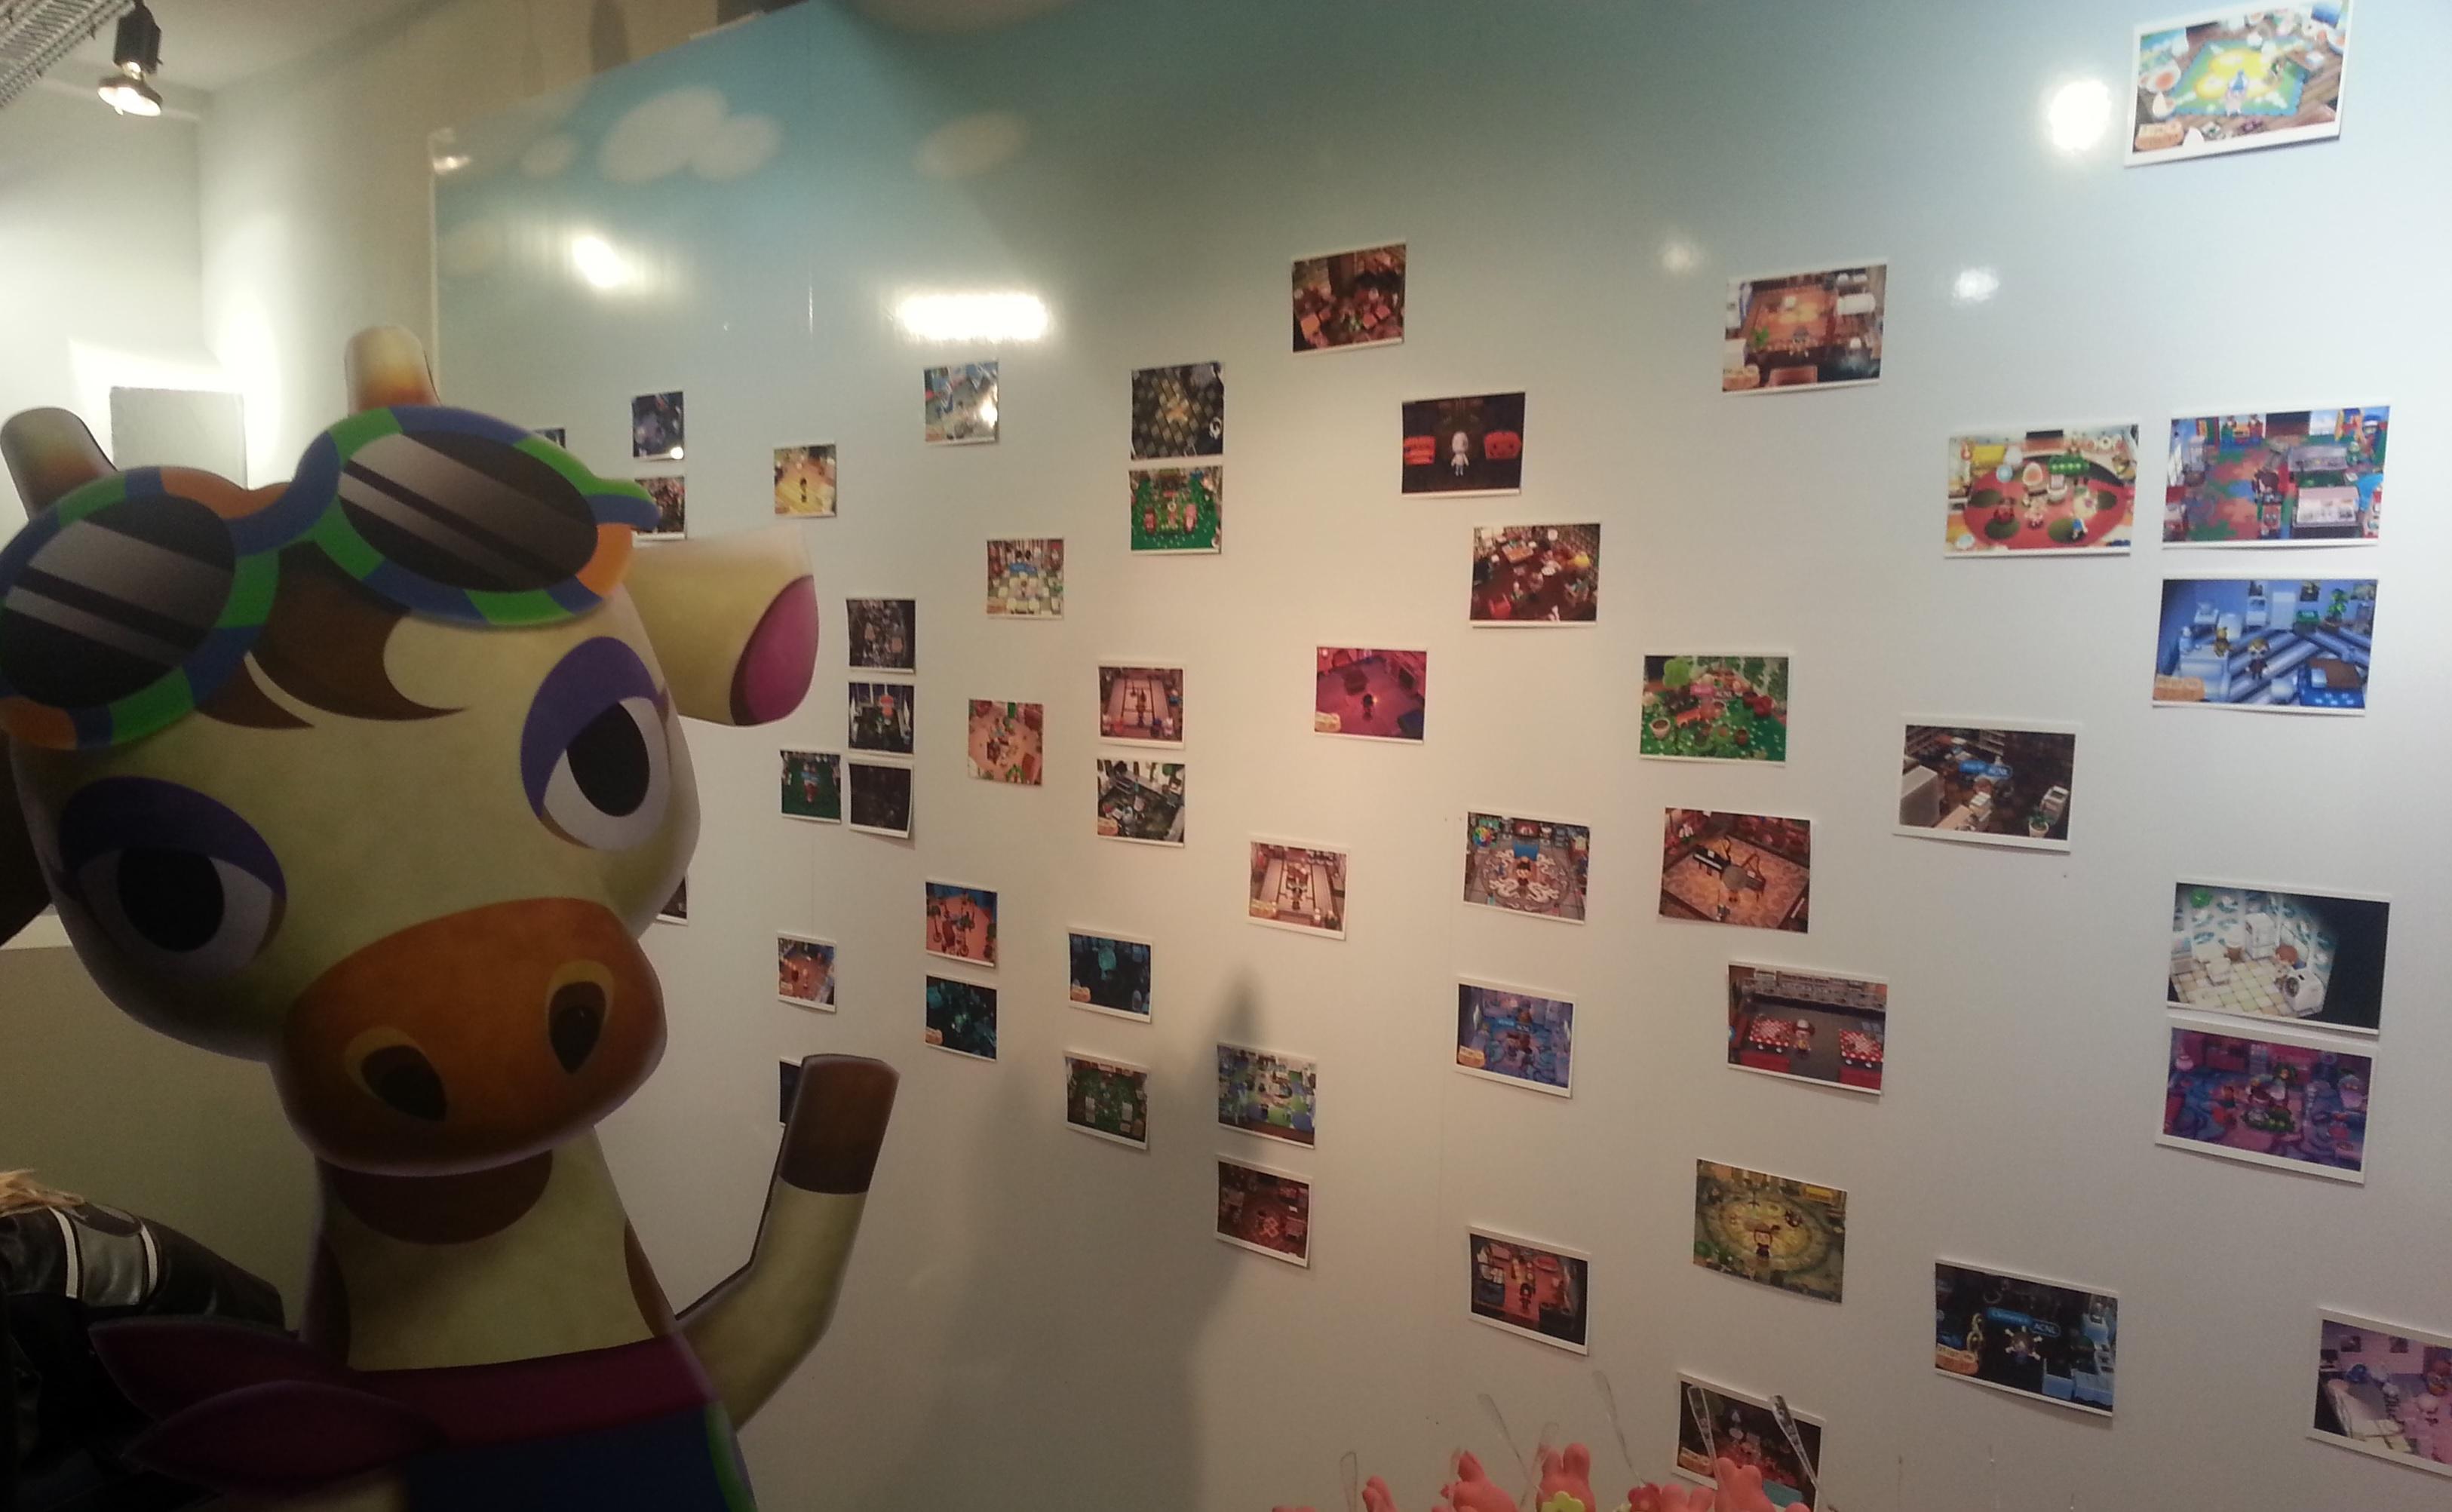 [COMPTE-RENDU] Exposition Animal Crossing : New Leaf